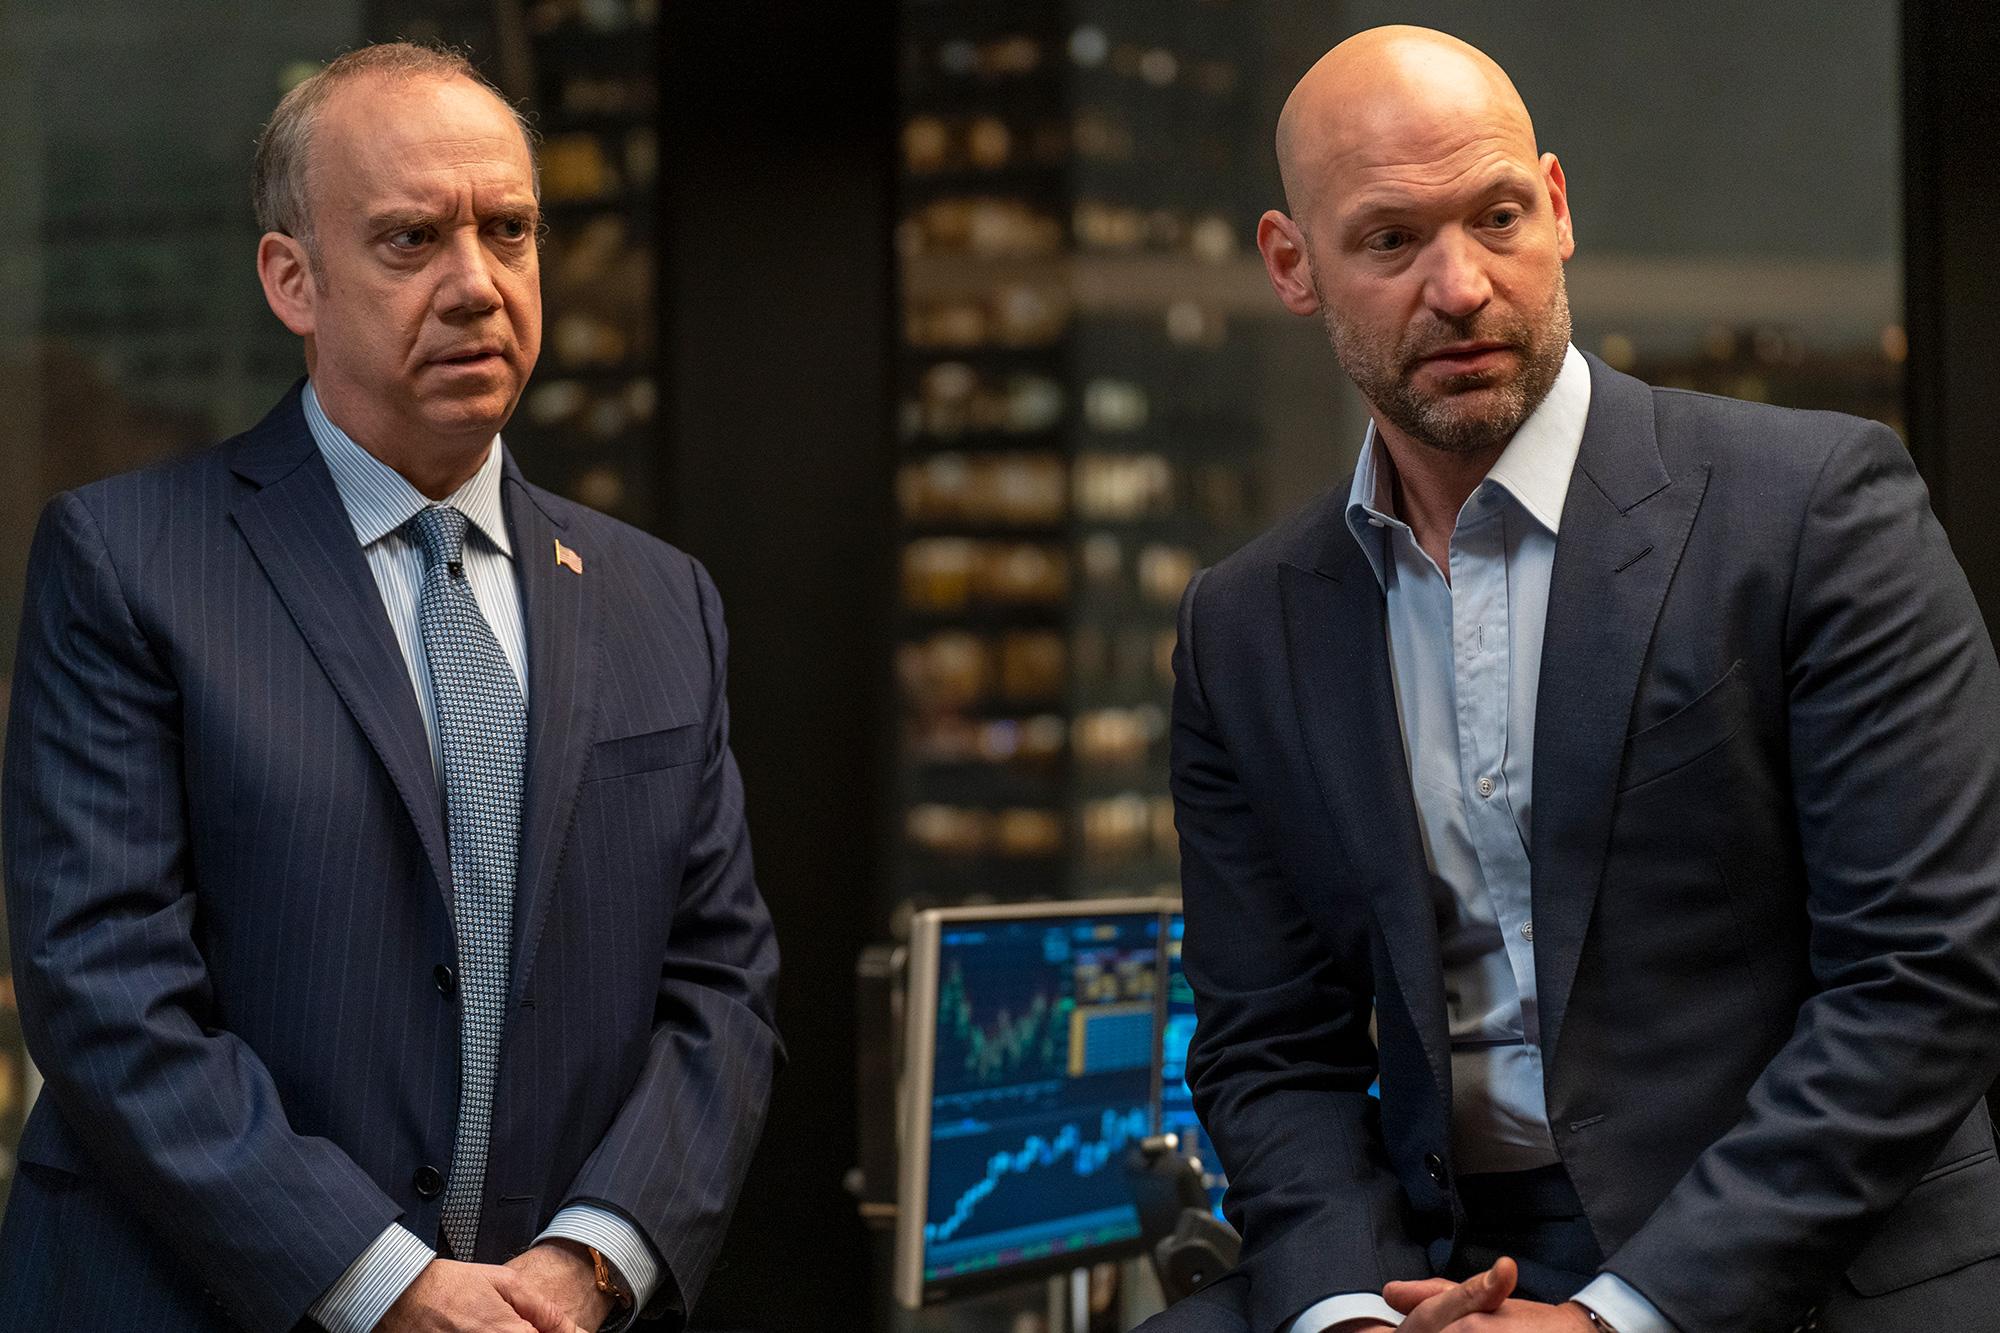 "(L-R): Paul Giamatti as Chuck Rhoades and Corey Stoll as Michael Prince in BILLIONS ""Victory Smoke""."